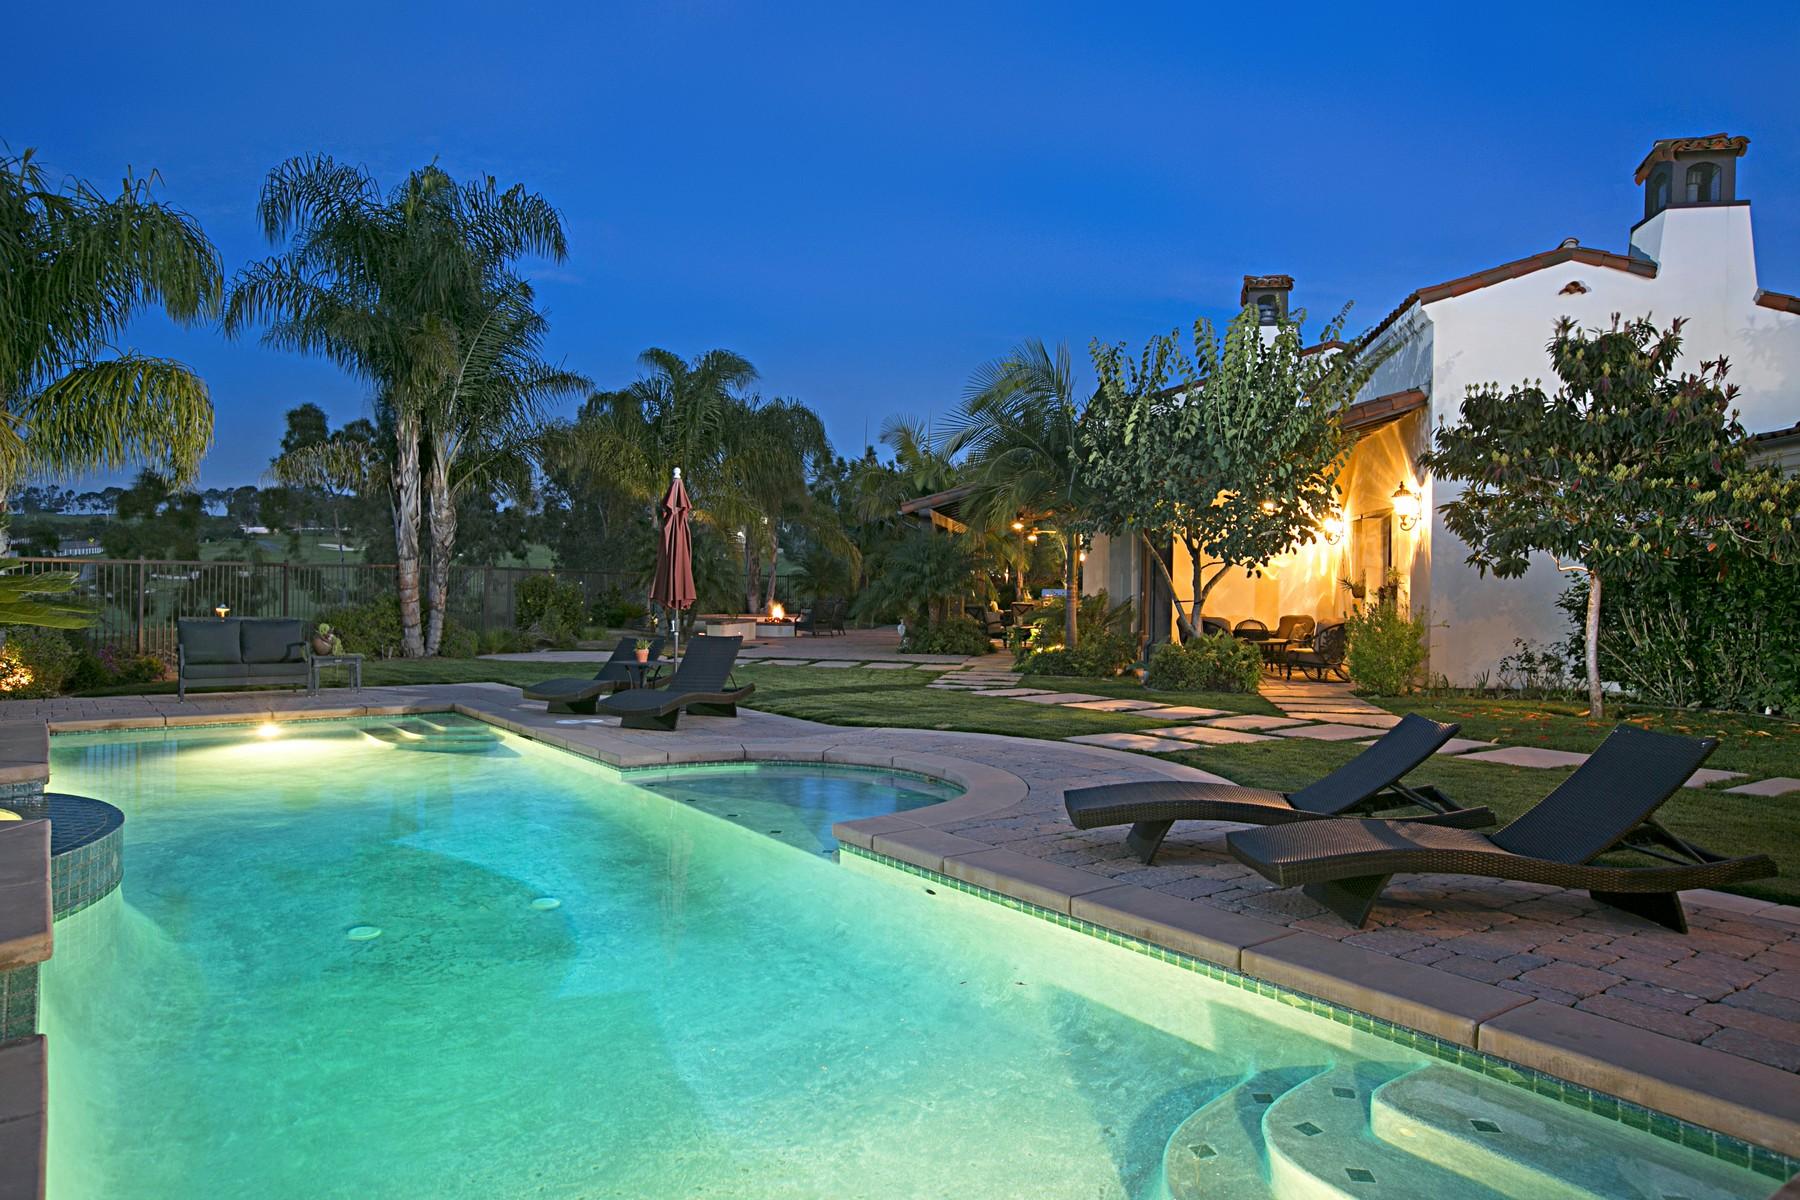 Single Family Home for Sale at 1202 Via Zumia 1202 Via Zamia Encinitas, California 92024 United States